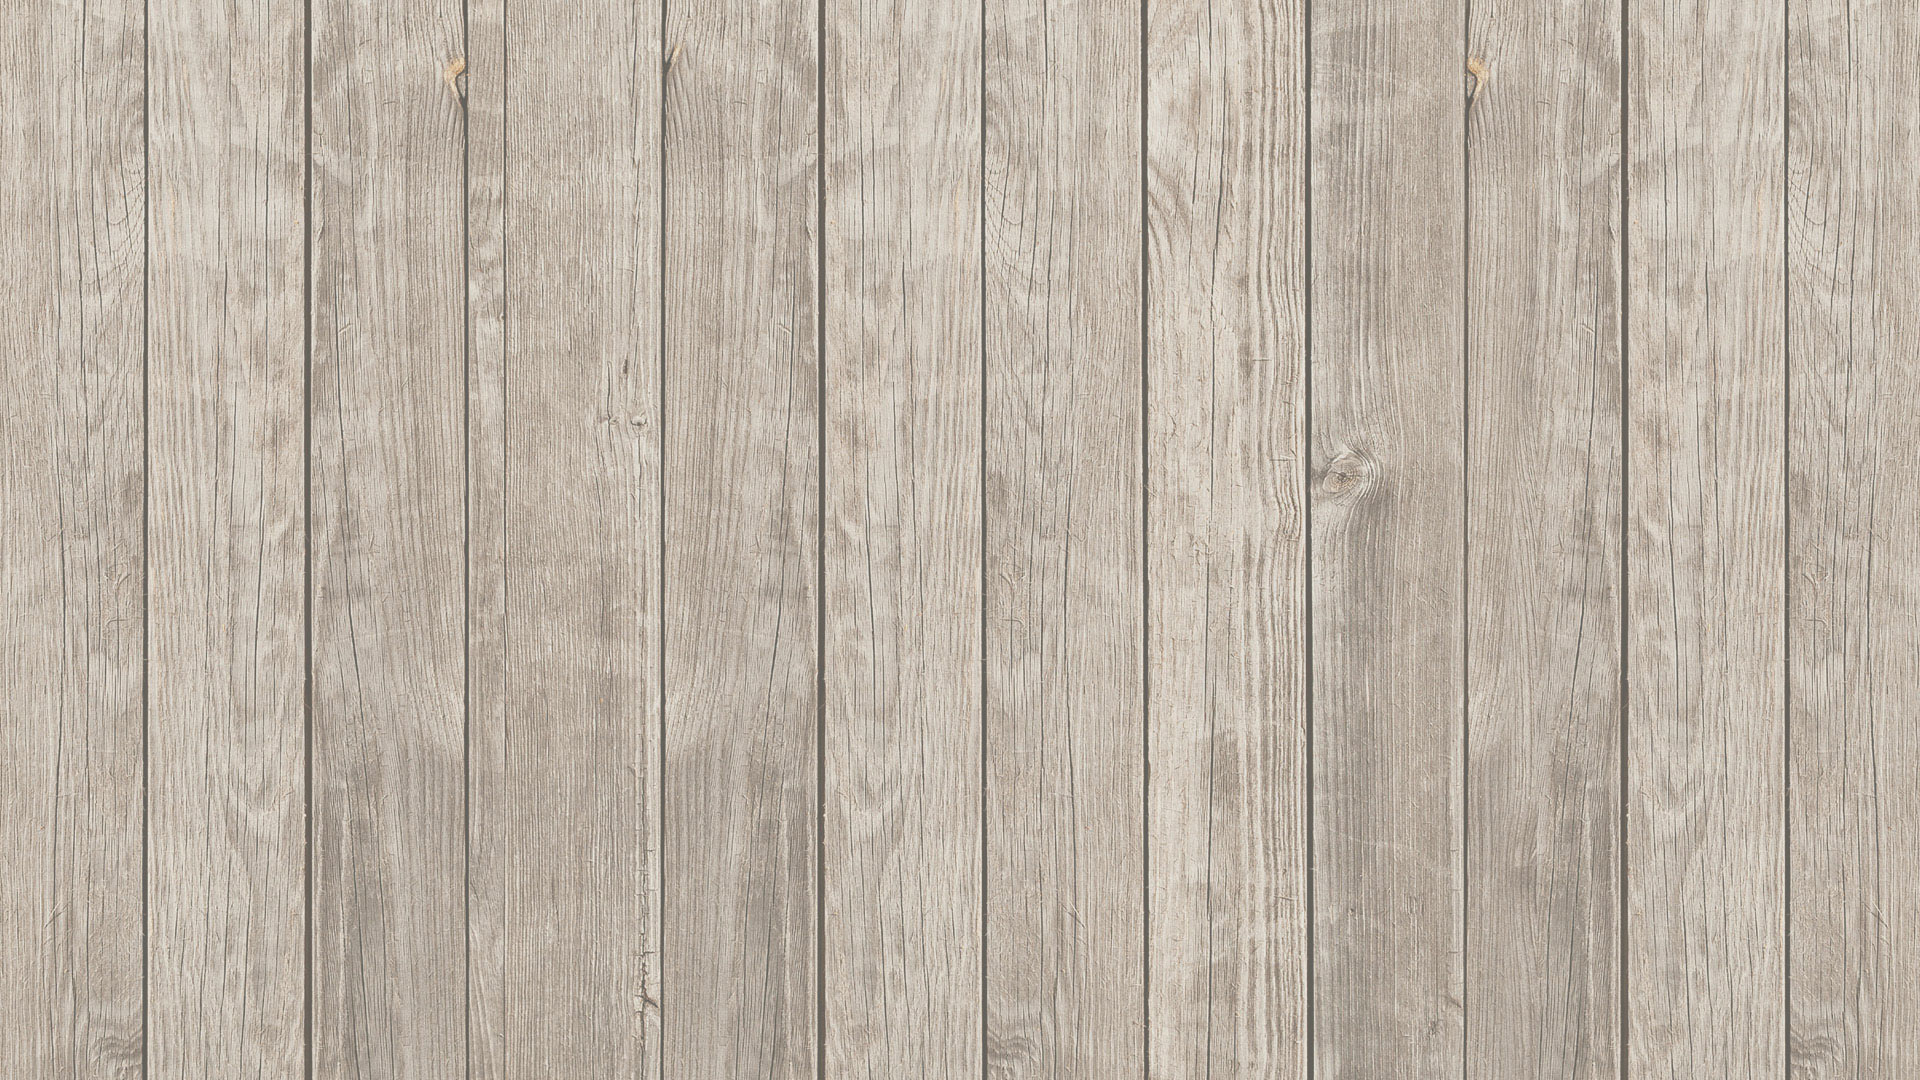 Light wood panel pixshark images galleries